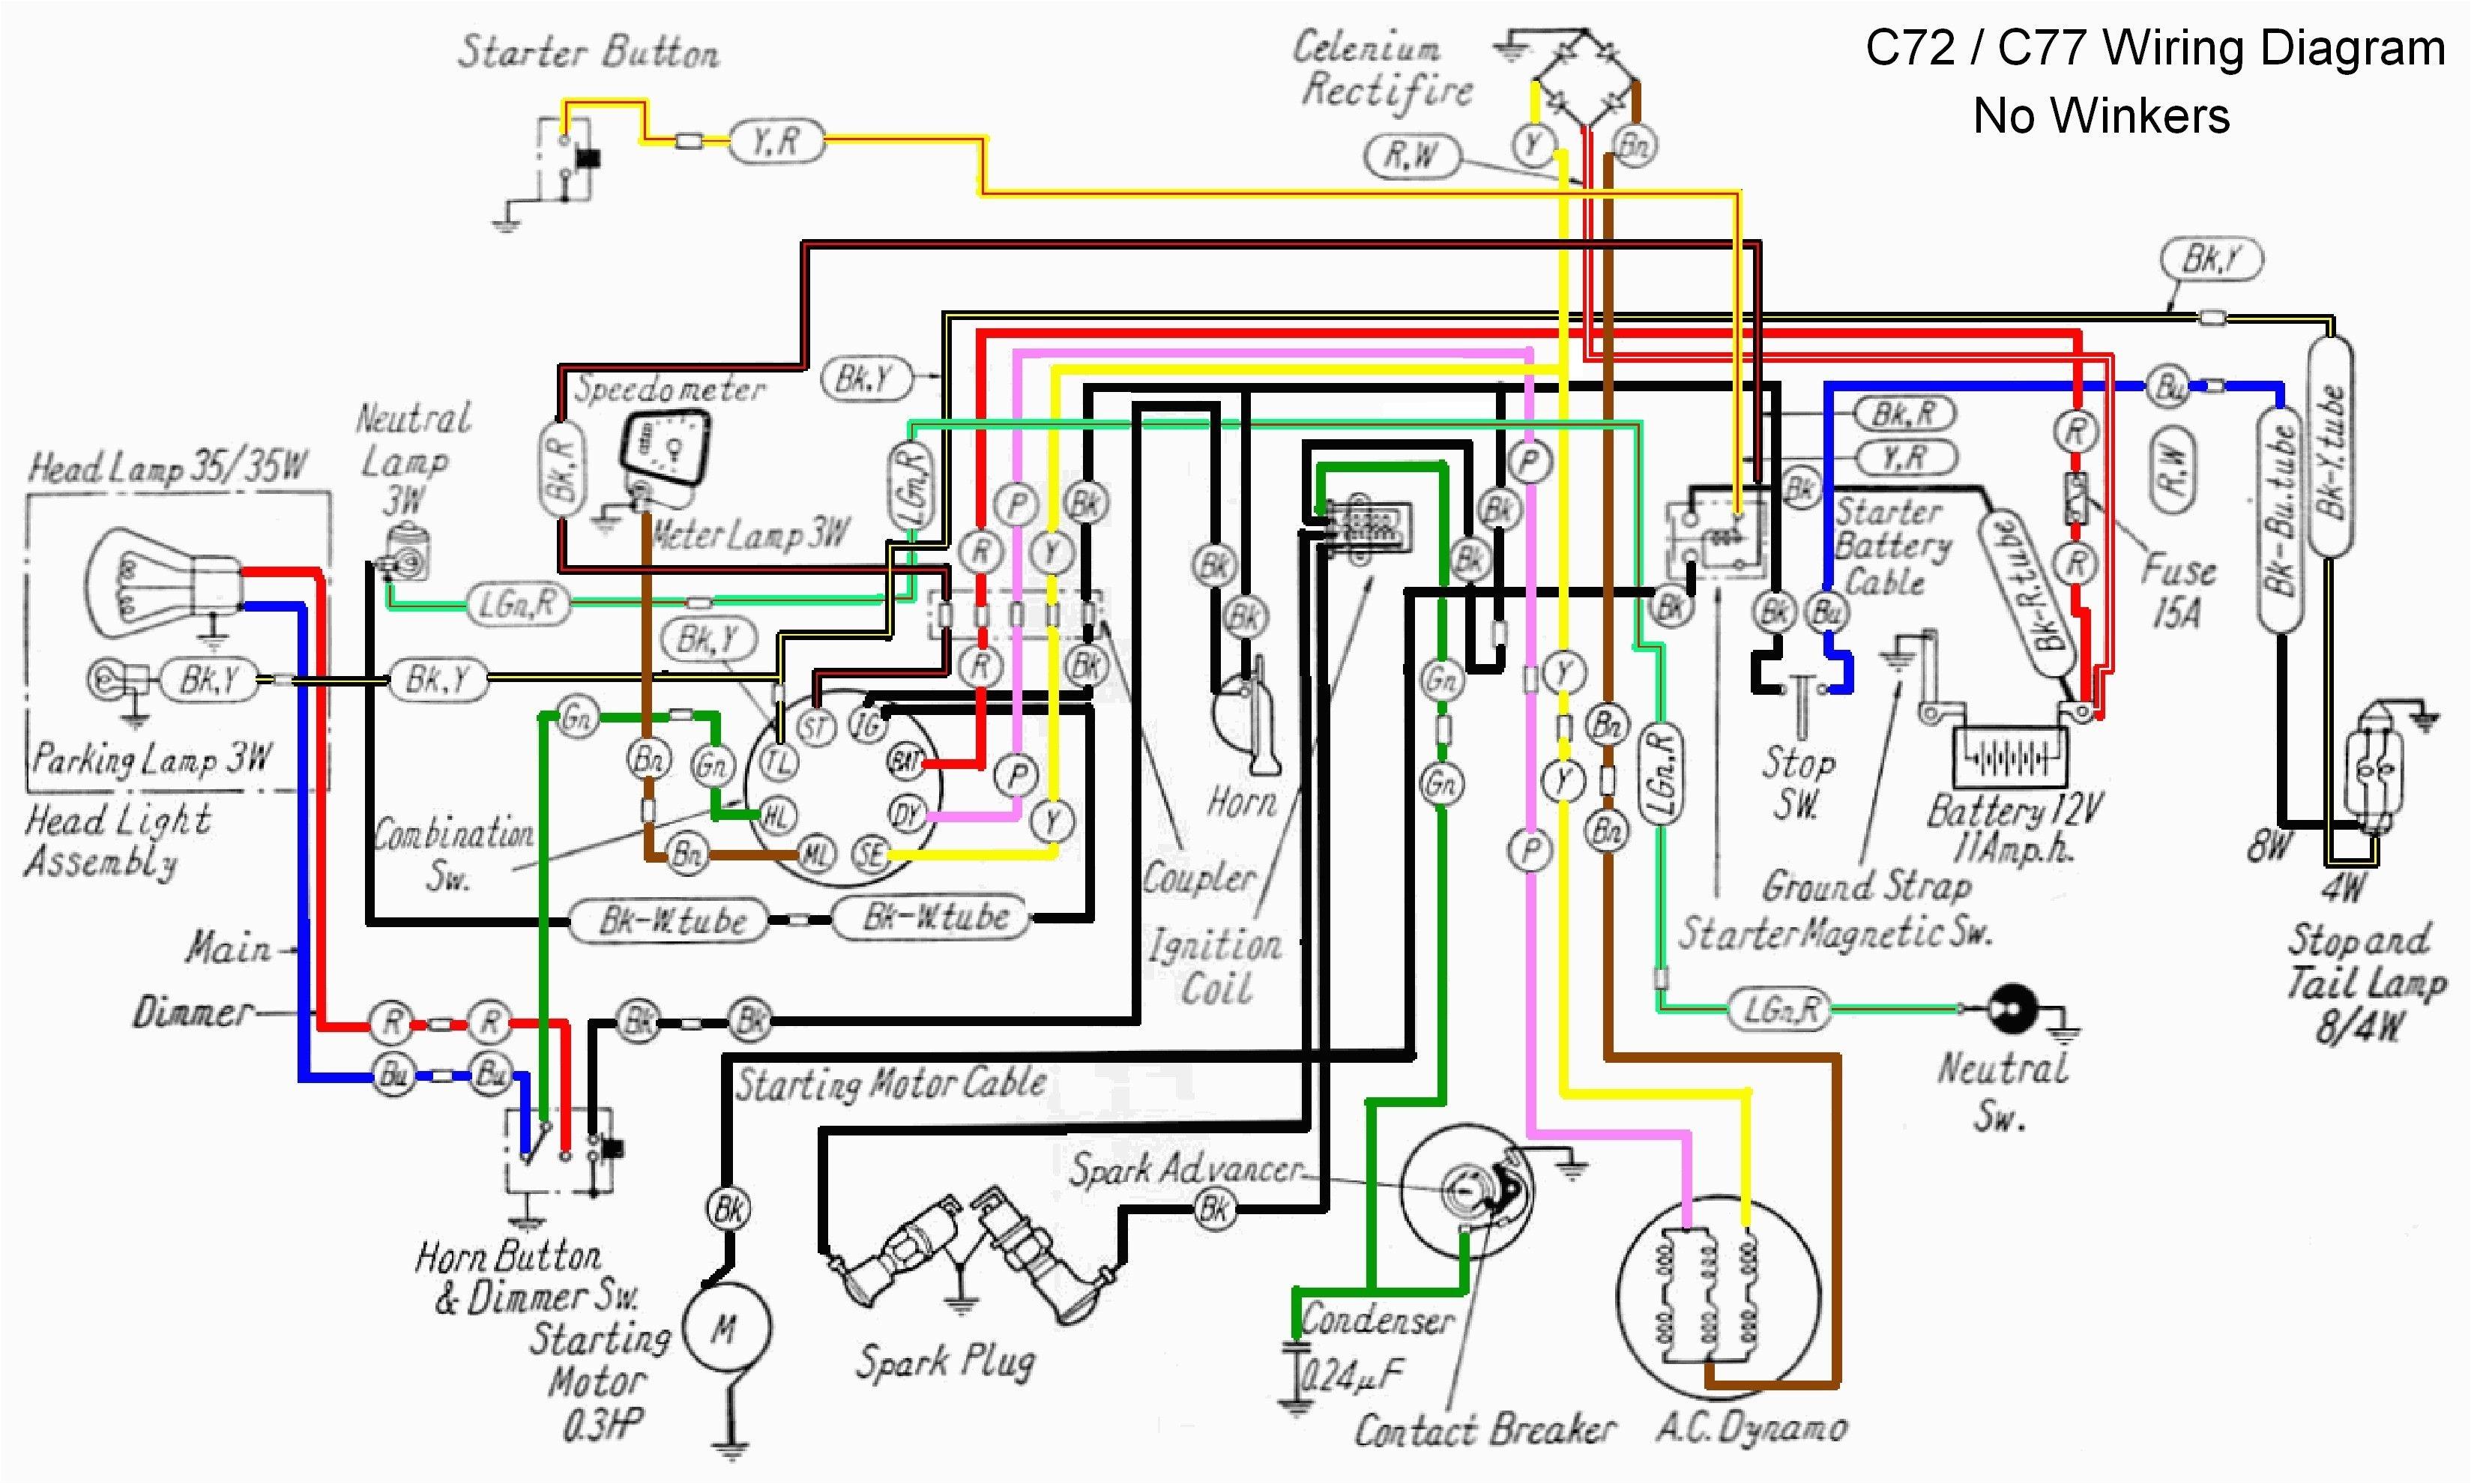 honda motorcycle wire diagram wiring diagram post honda motorcycle wiring diagrams pdf honda motorcycle wiring